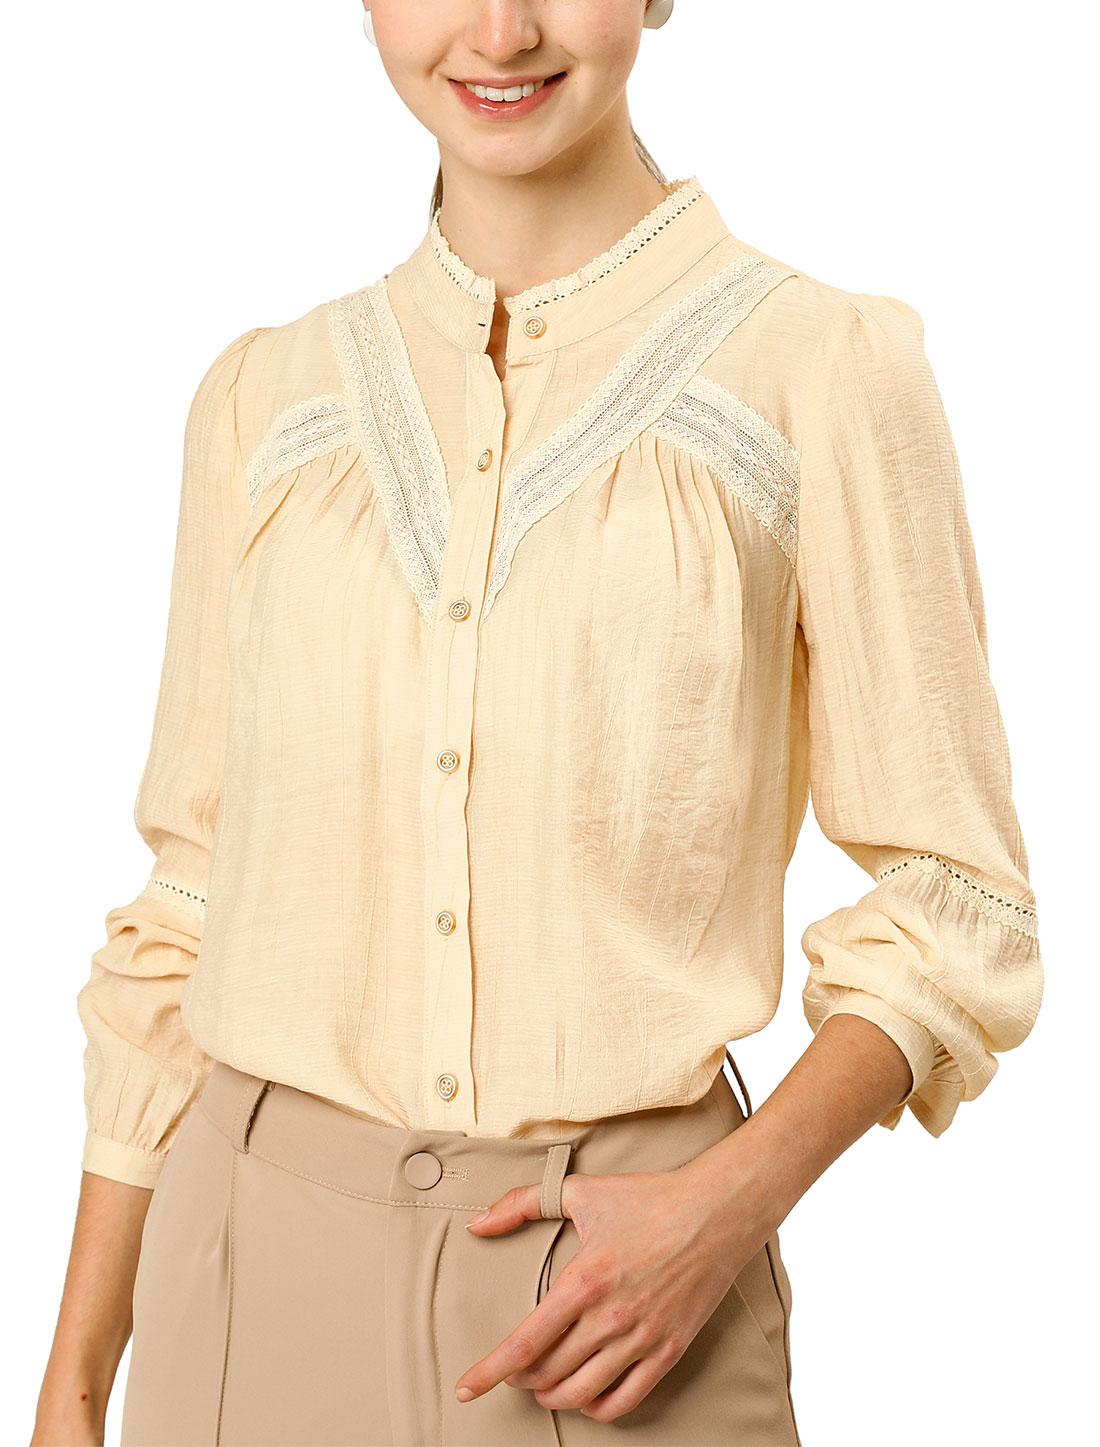 Allegra K Women's Fall Long Sleeve Blouse Boho Casual Button Down Shirt Beige L